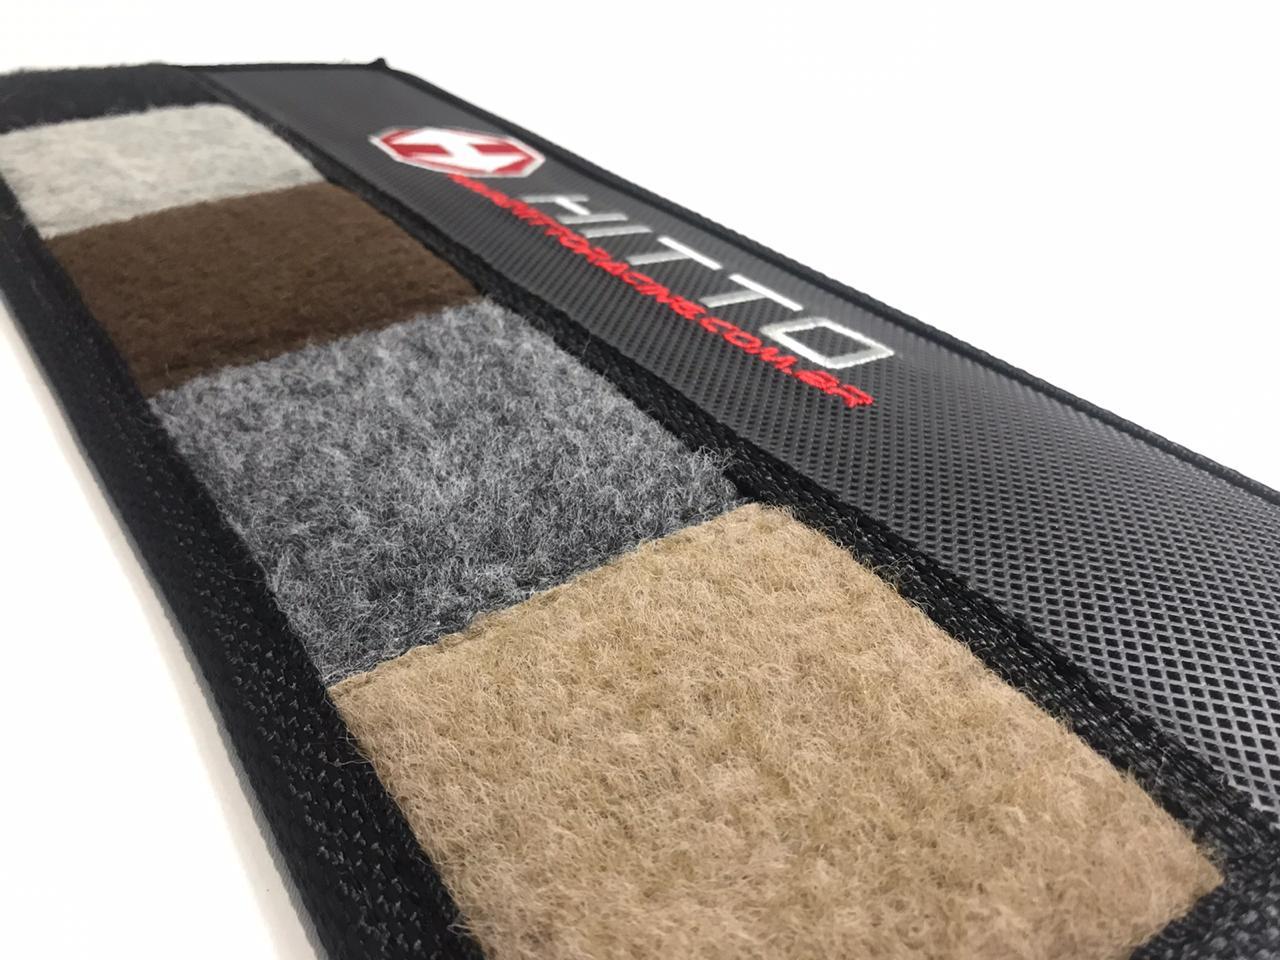 Tapete Subaru Wrx 2017 Carpete Luxo Base Pinada